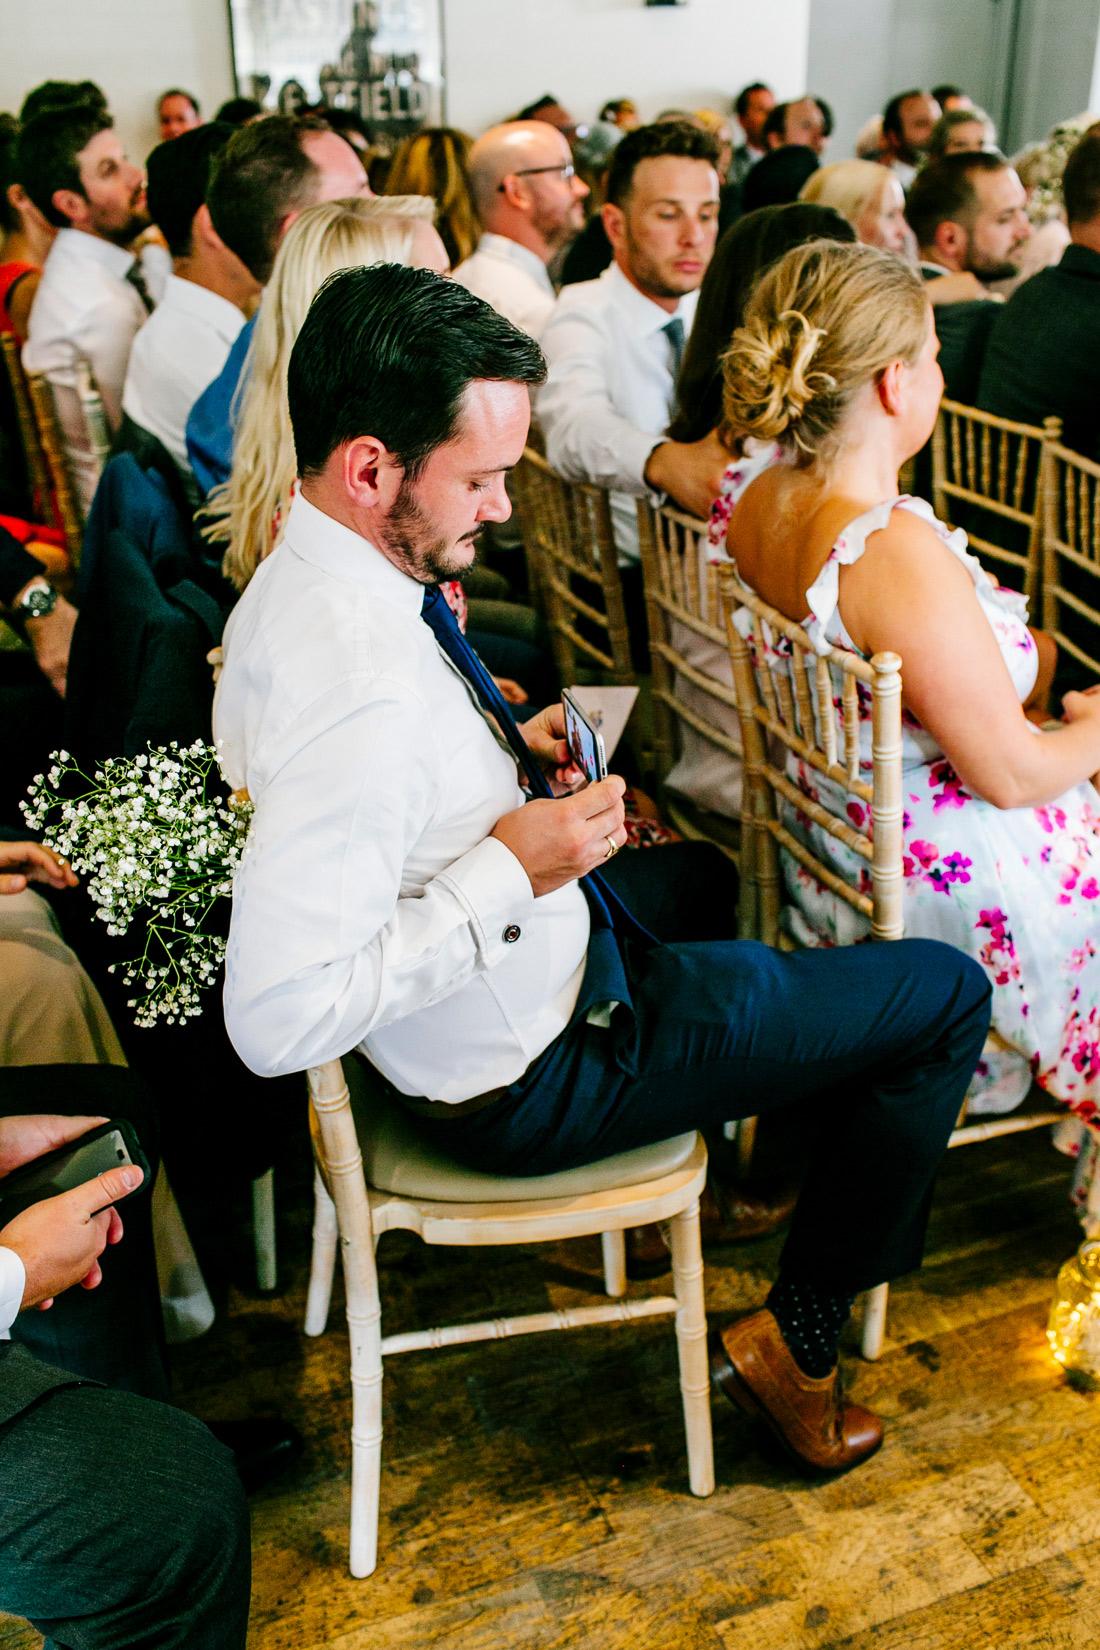 kent-wedding-photographer-Epic-Love-Story-001-37